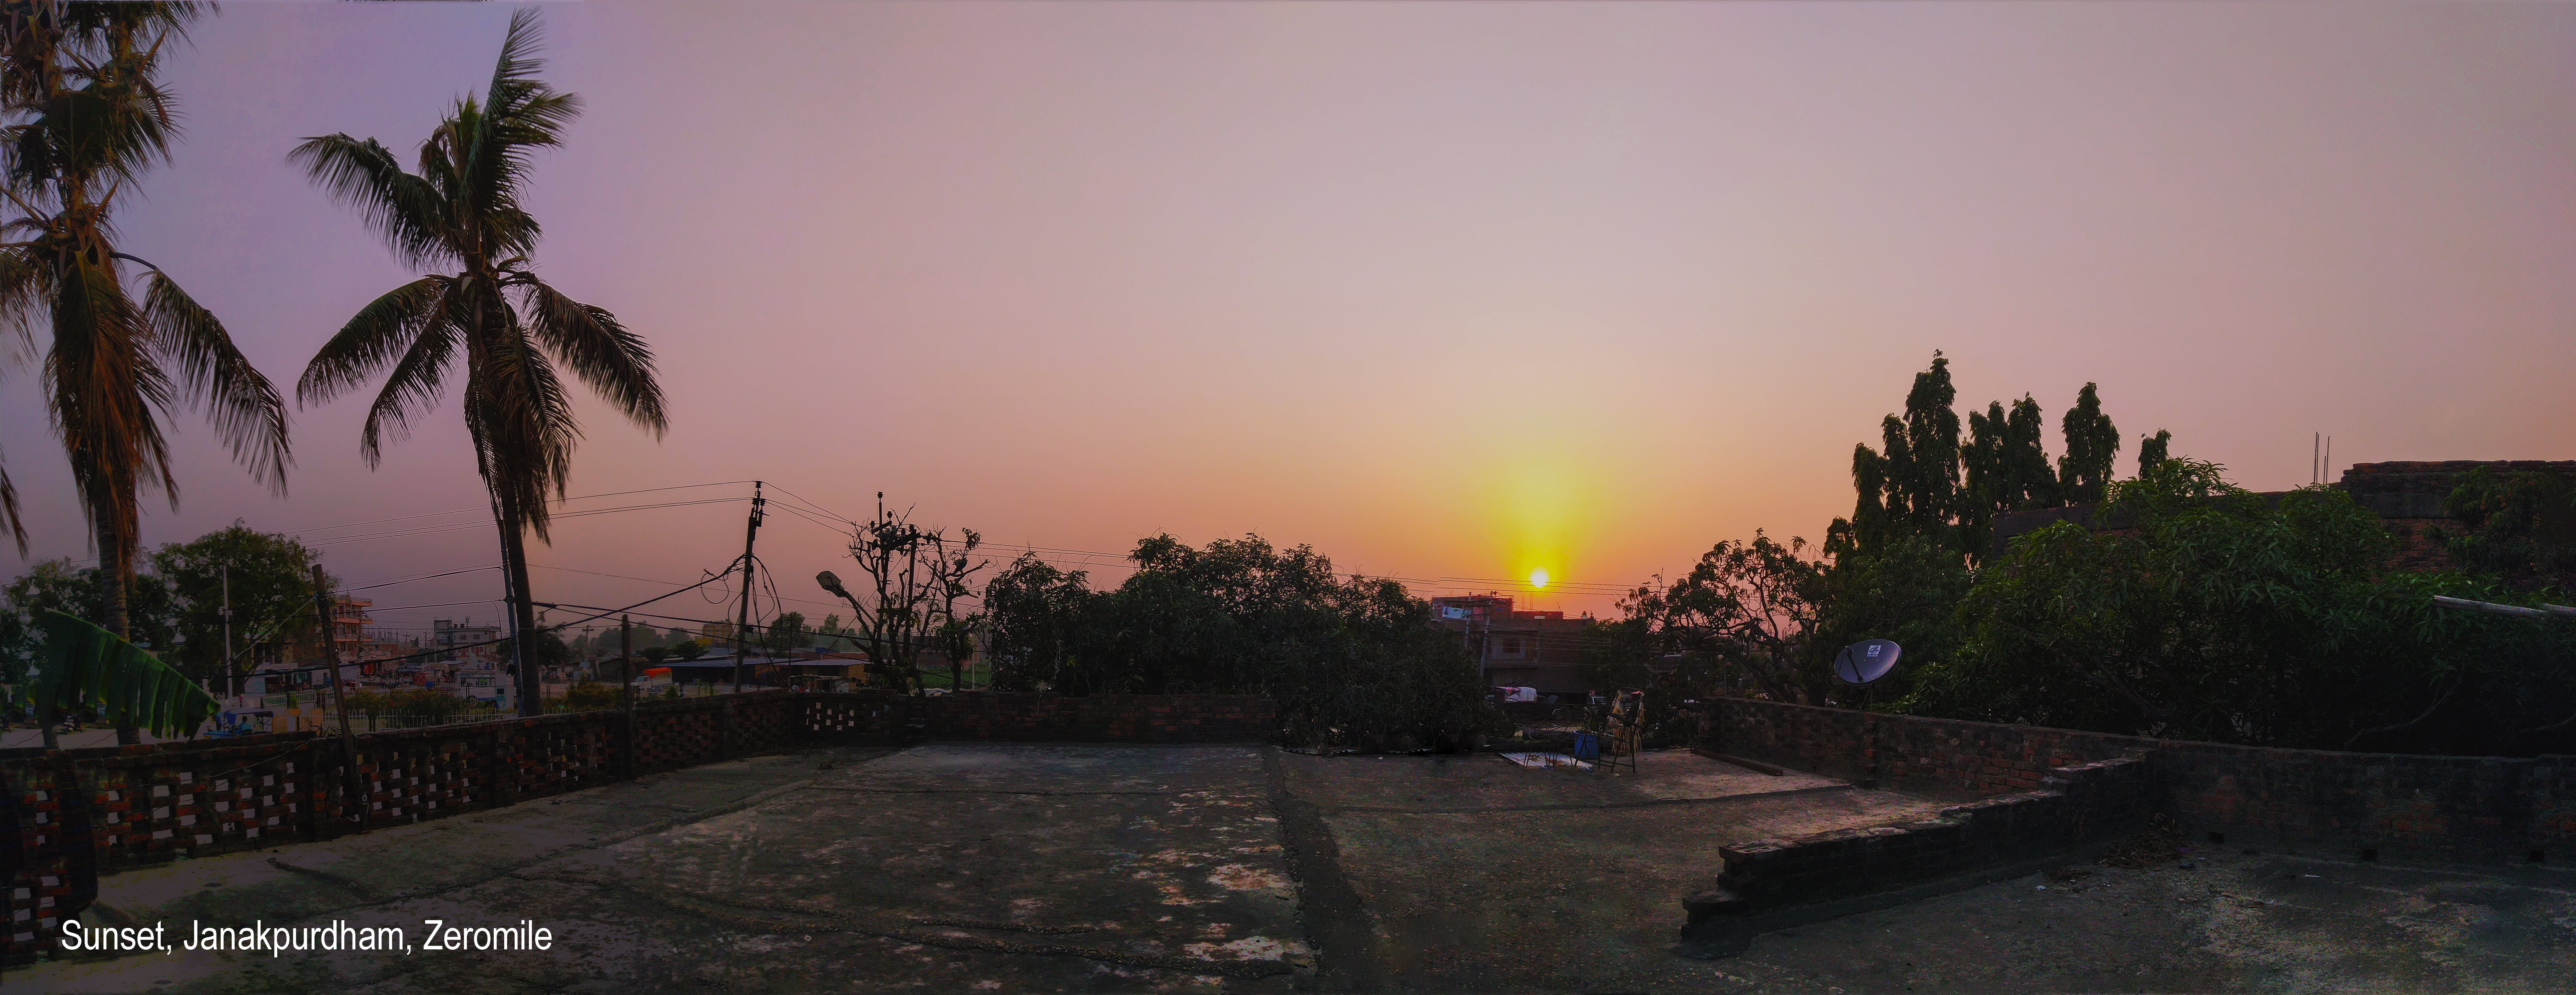 Free stock photo of coconut, evening, Evening plants, evening sky